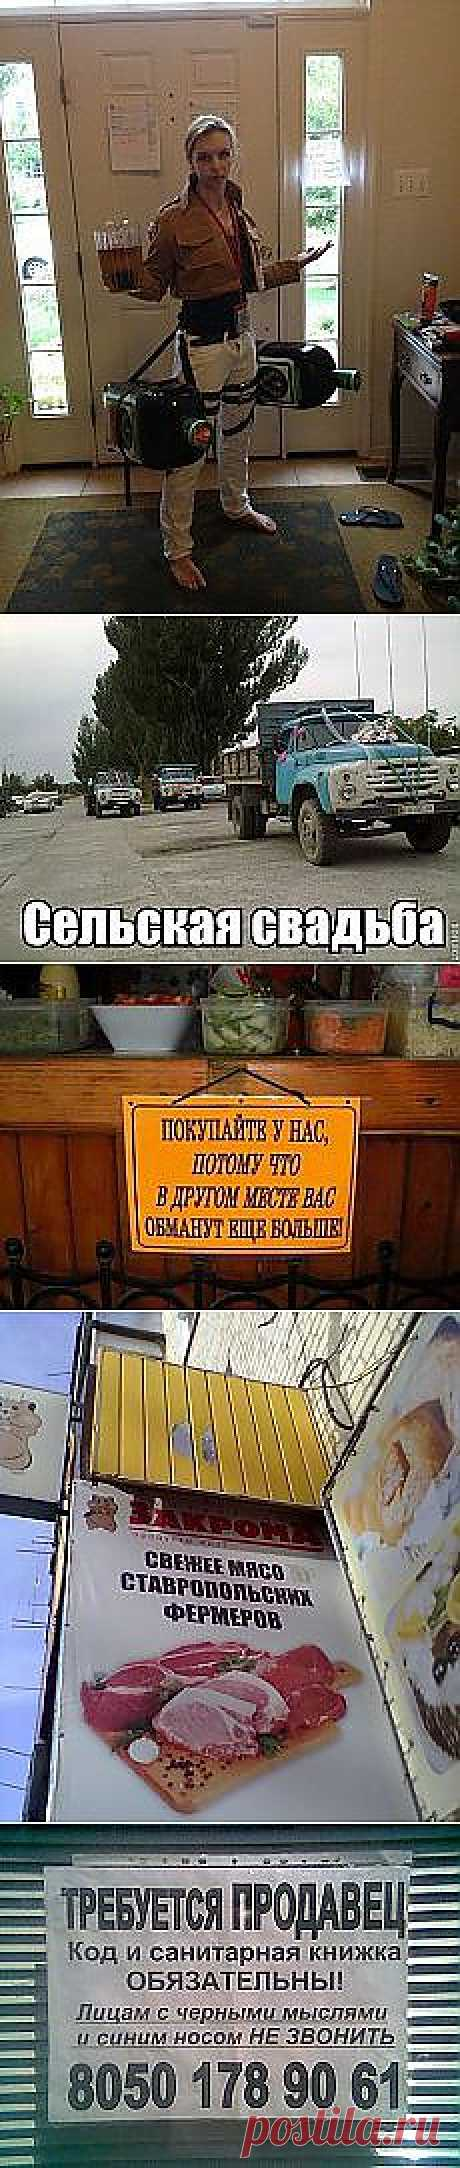 Посты с oborzhaka.forblabla.com   Постила.ru